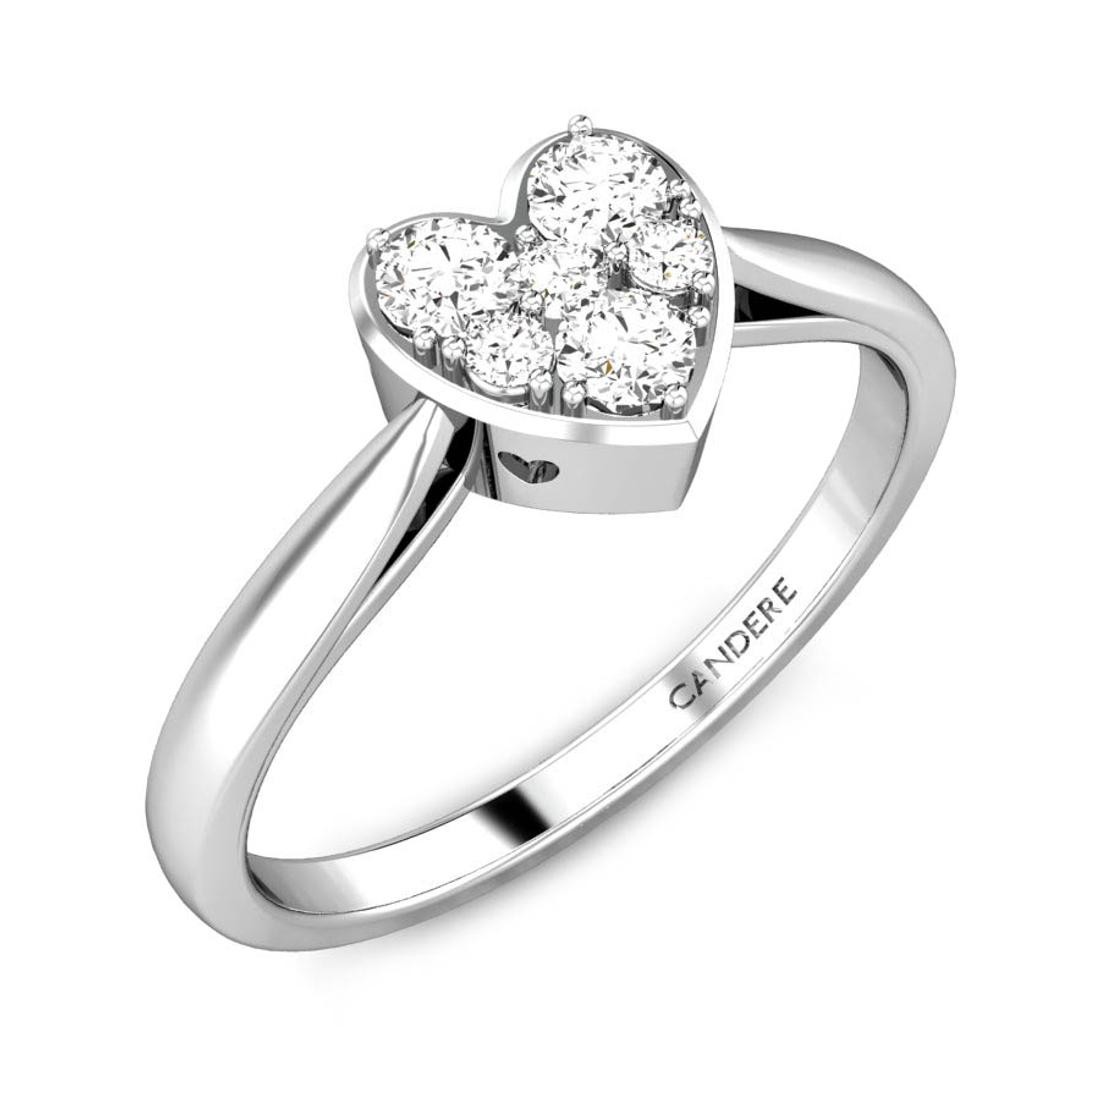 Candere By Kalyan Jewellers 14k (585) BIS Hallmark White Gold Heart of light Ziah Diamond Ring (IGI Certified)